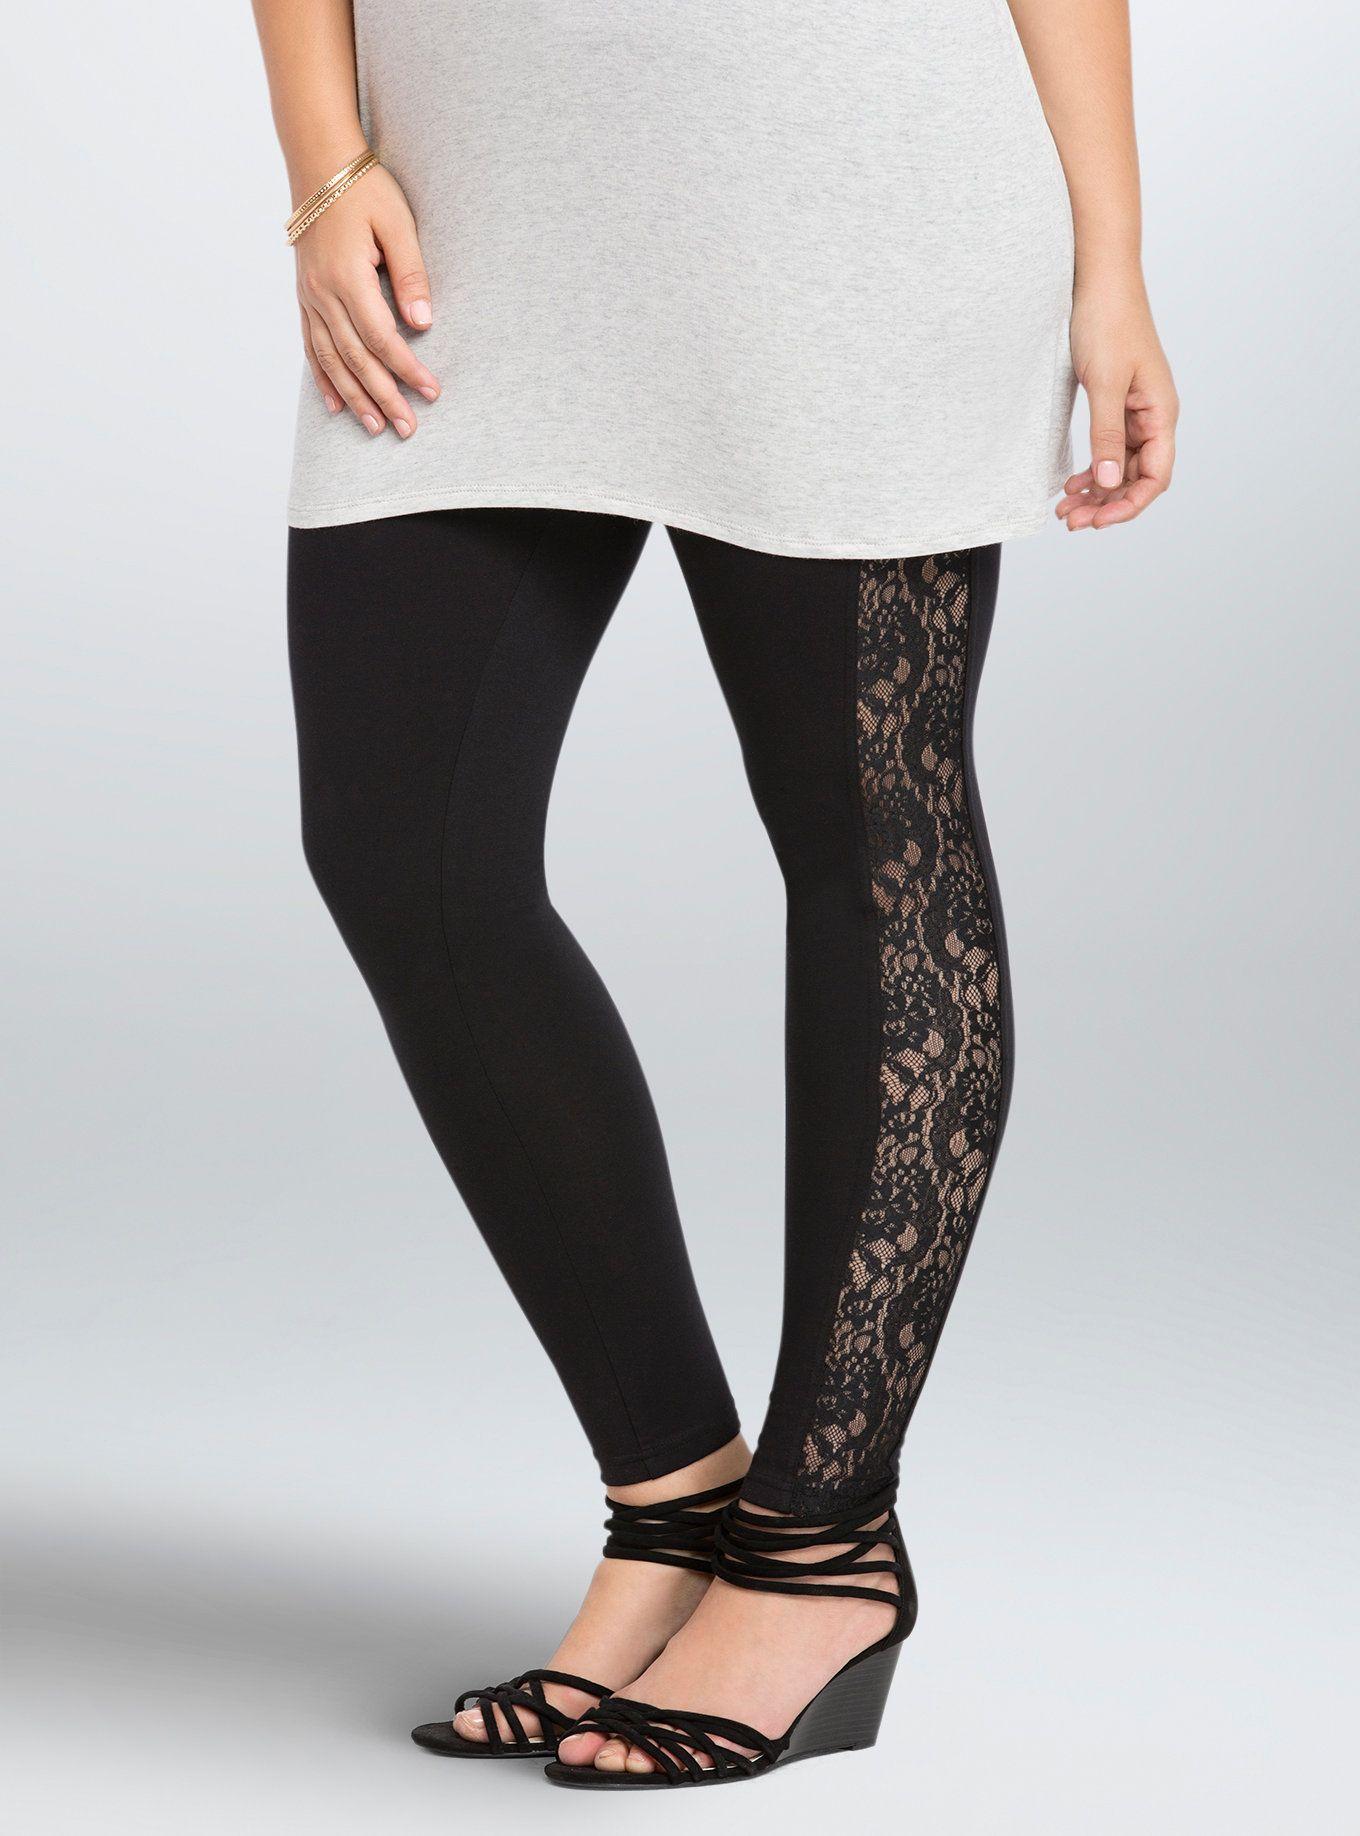 c17876181fde3 Lace Trim Full Length Leggings | Styles for Bodacious Babes | Plus ...